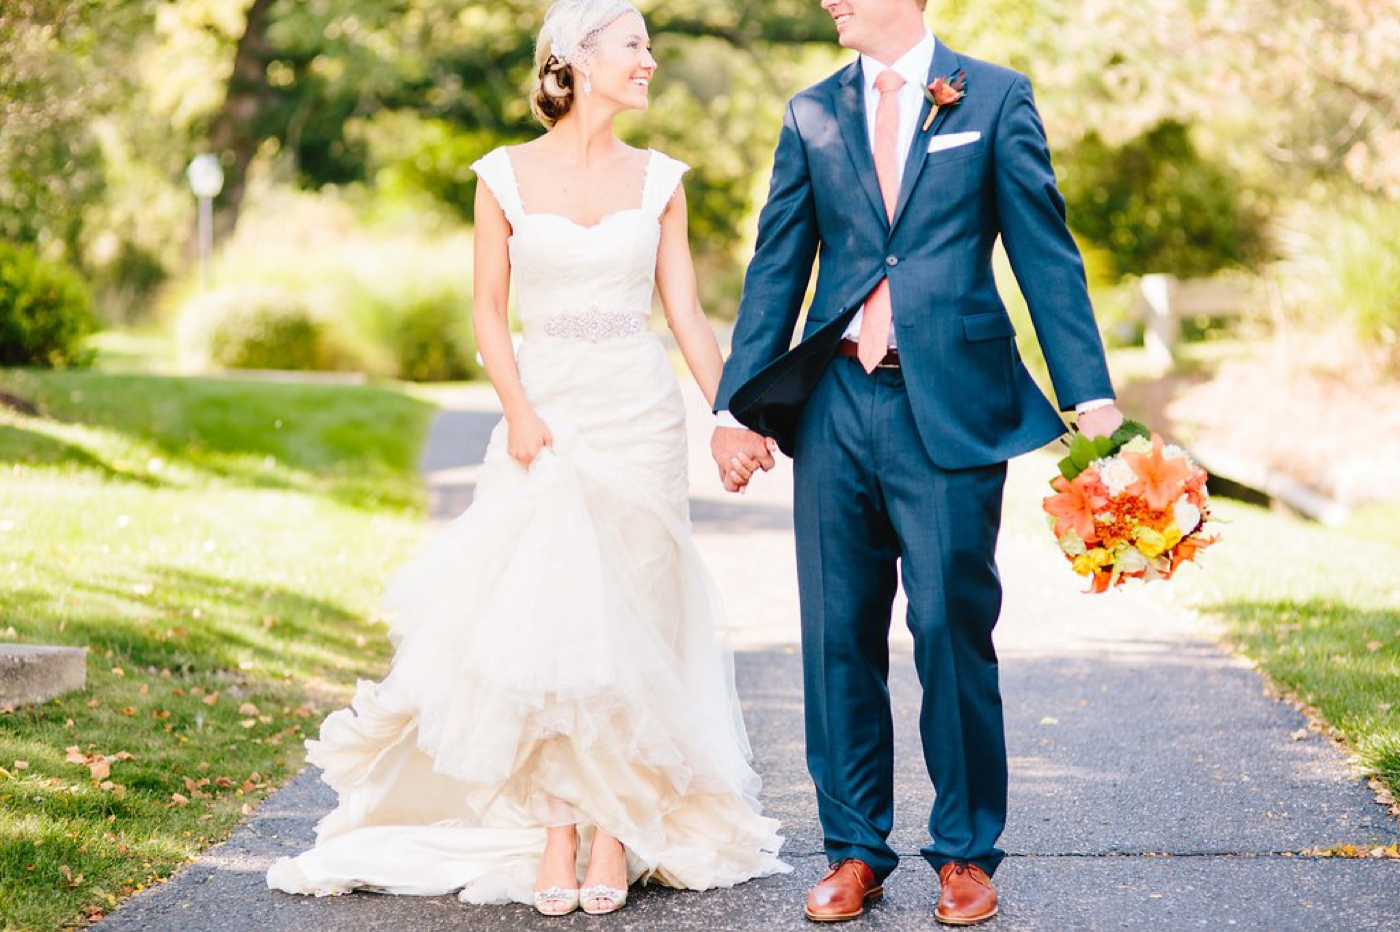 chicago-fine-art-wedding-photography-saylor32